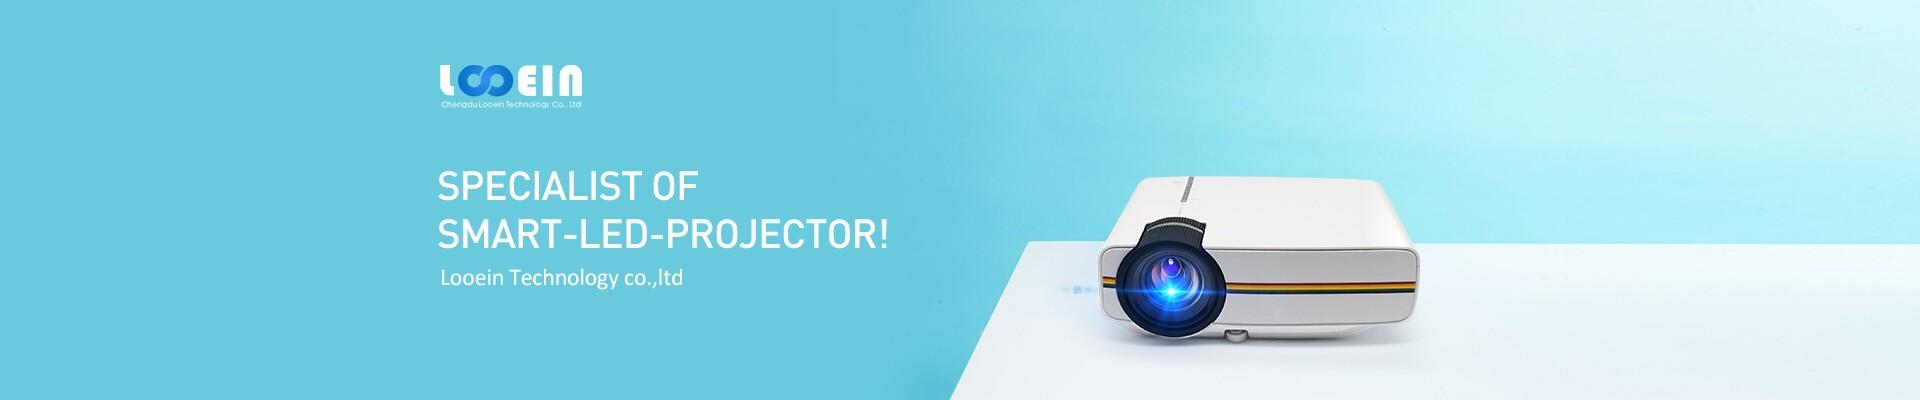 Smart Projector01